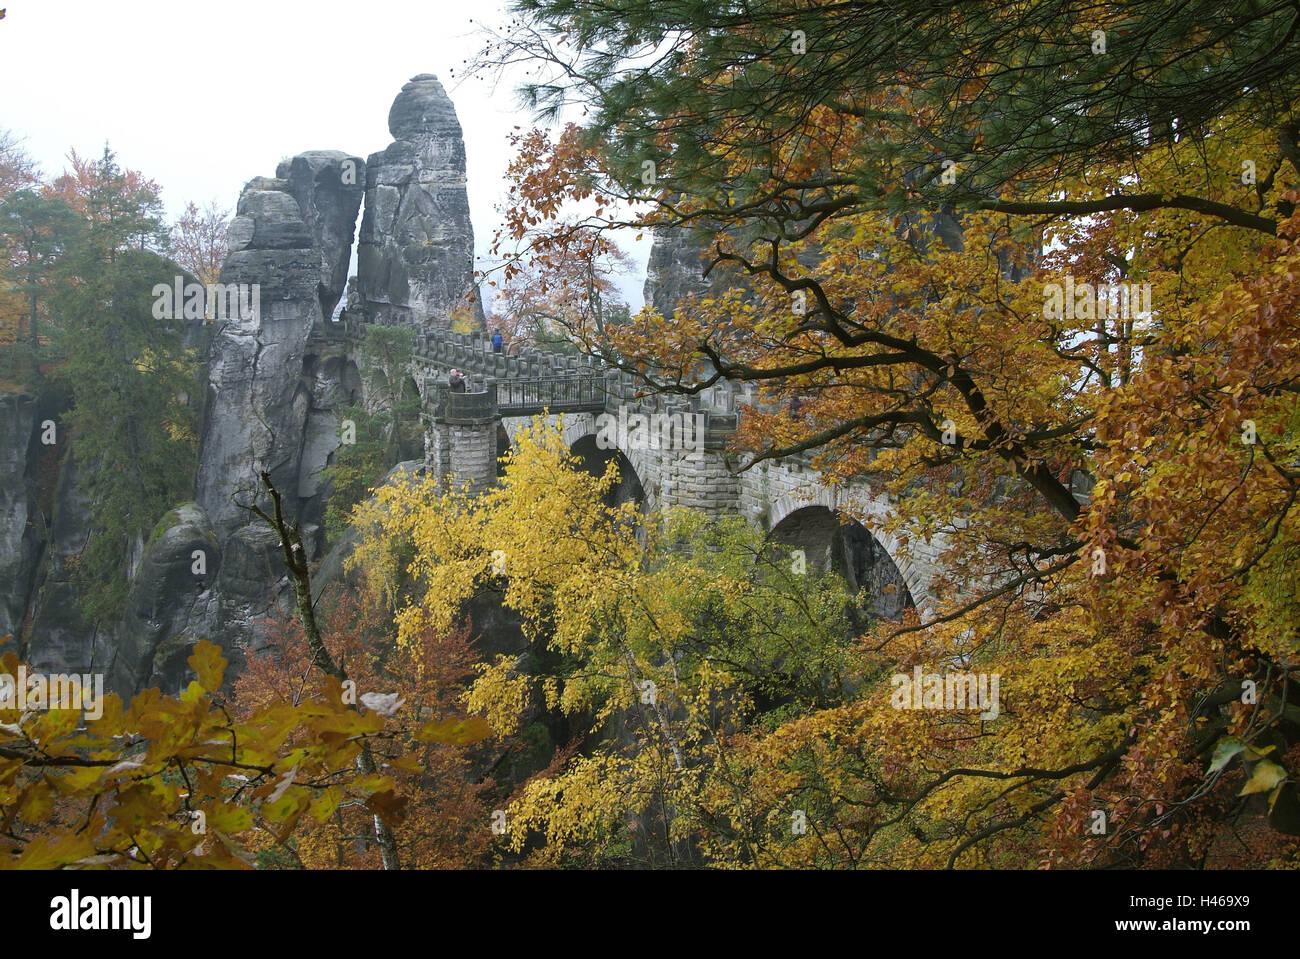 Germany, Saxony, Elbsandsteingebirge, bastion, bastion bridge, Stock Photo